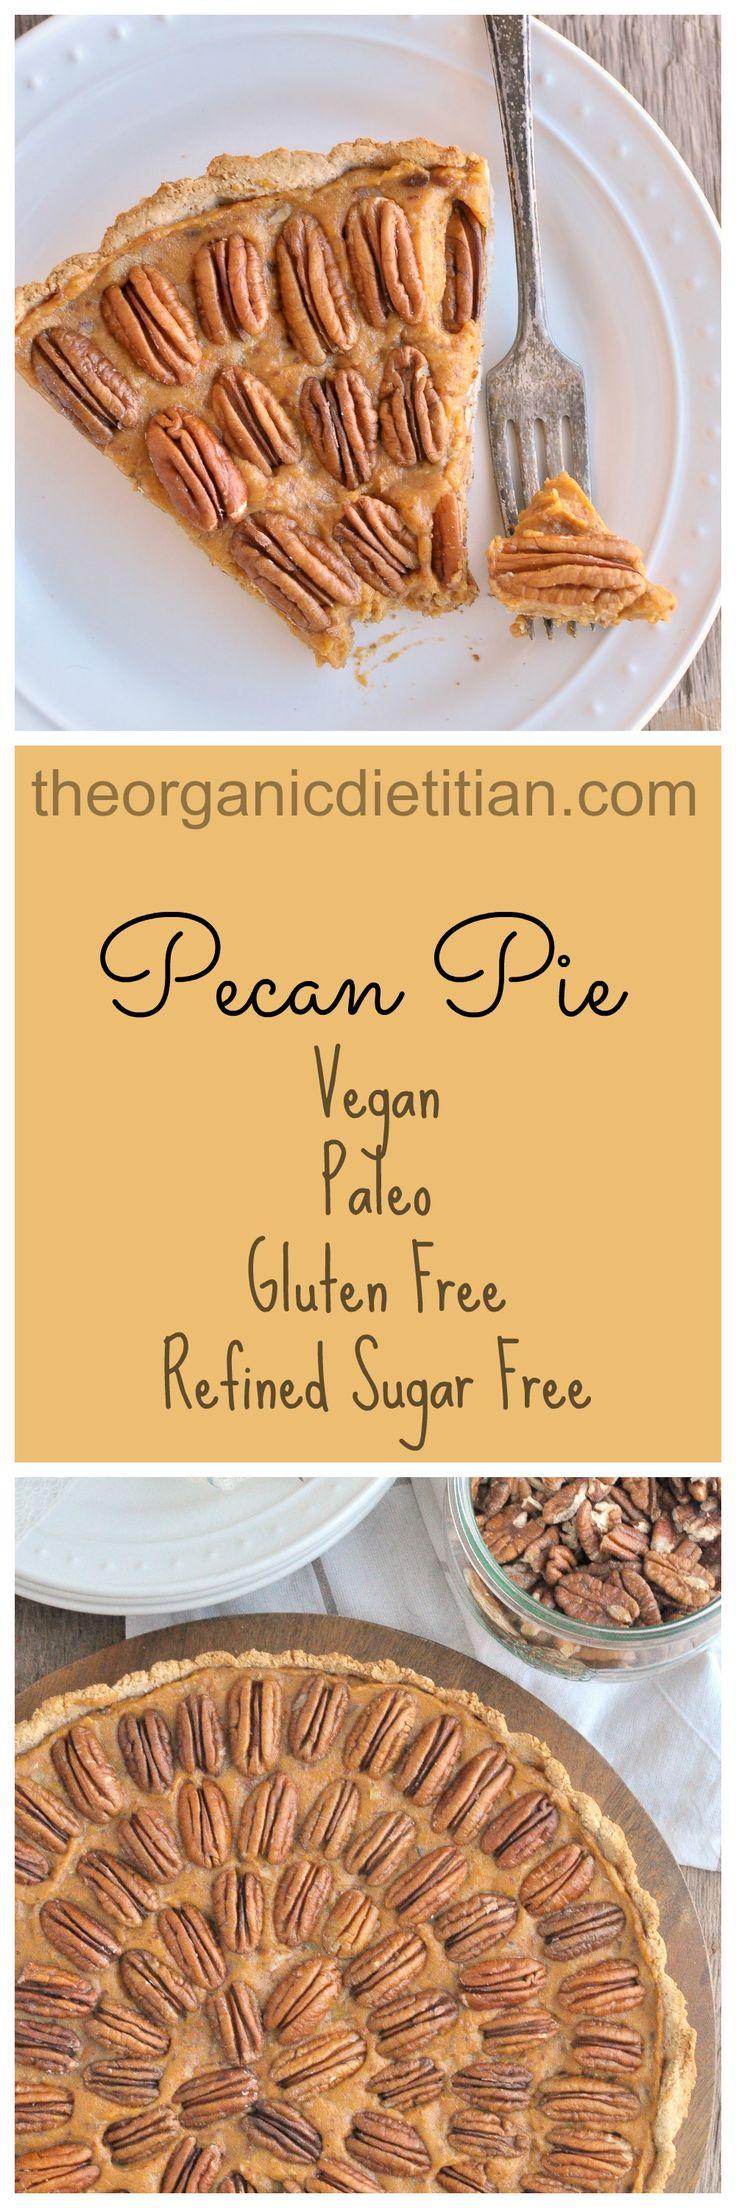 Clean Pecan Pie (#vegan #paleo #glutenfree, refined sugar free).jgp